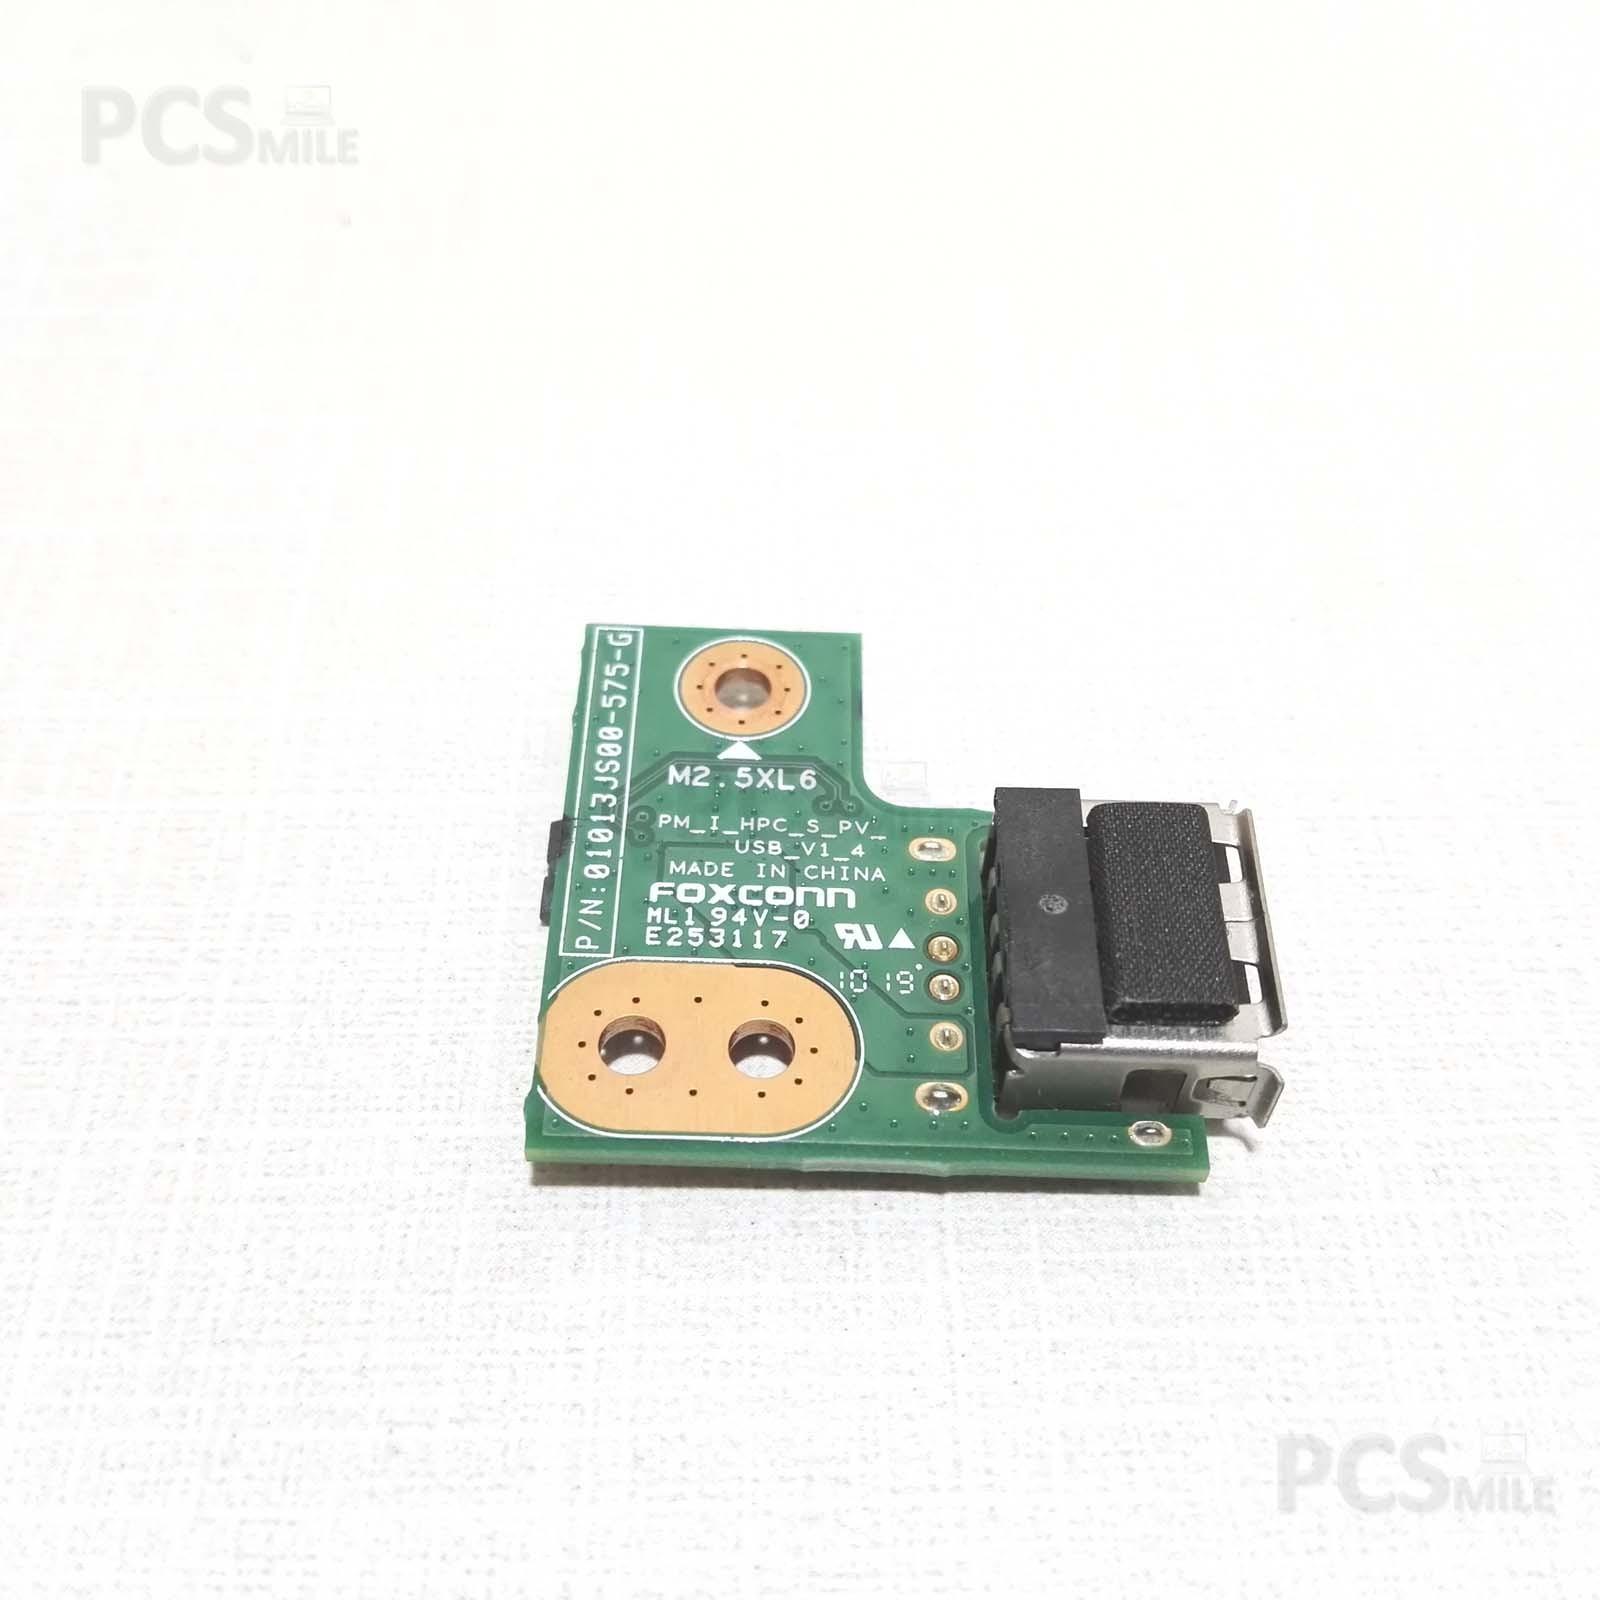 Posta USB scheda 01013js00-575-g originale HP G62 serie